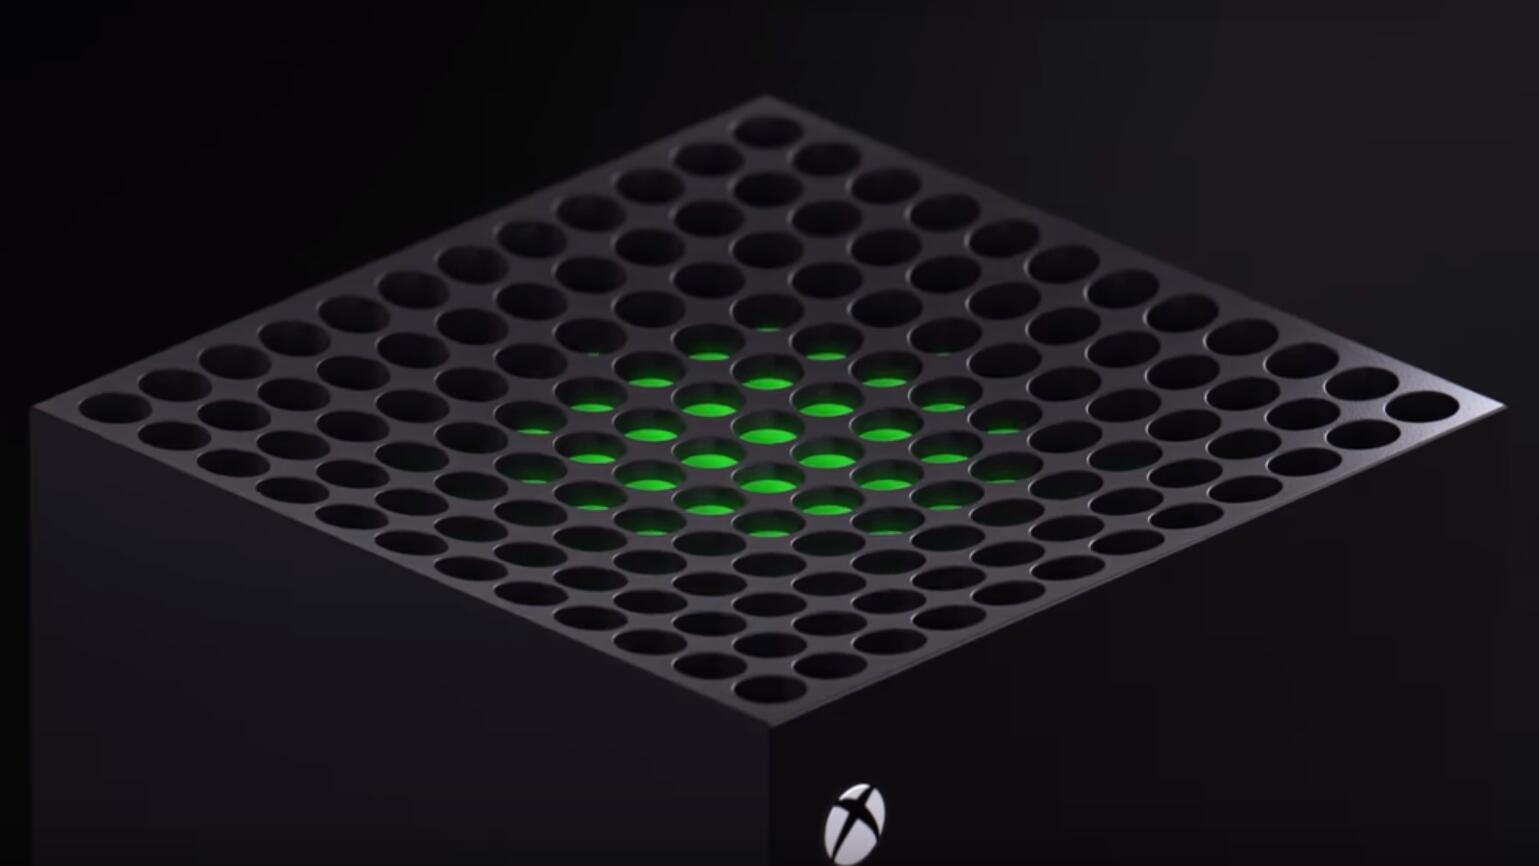 Bild zu Microsoft, Xbox One, Xbox Series X, Master Chief, Exklusiv, PC, Spiel, Game, Konsole